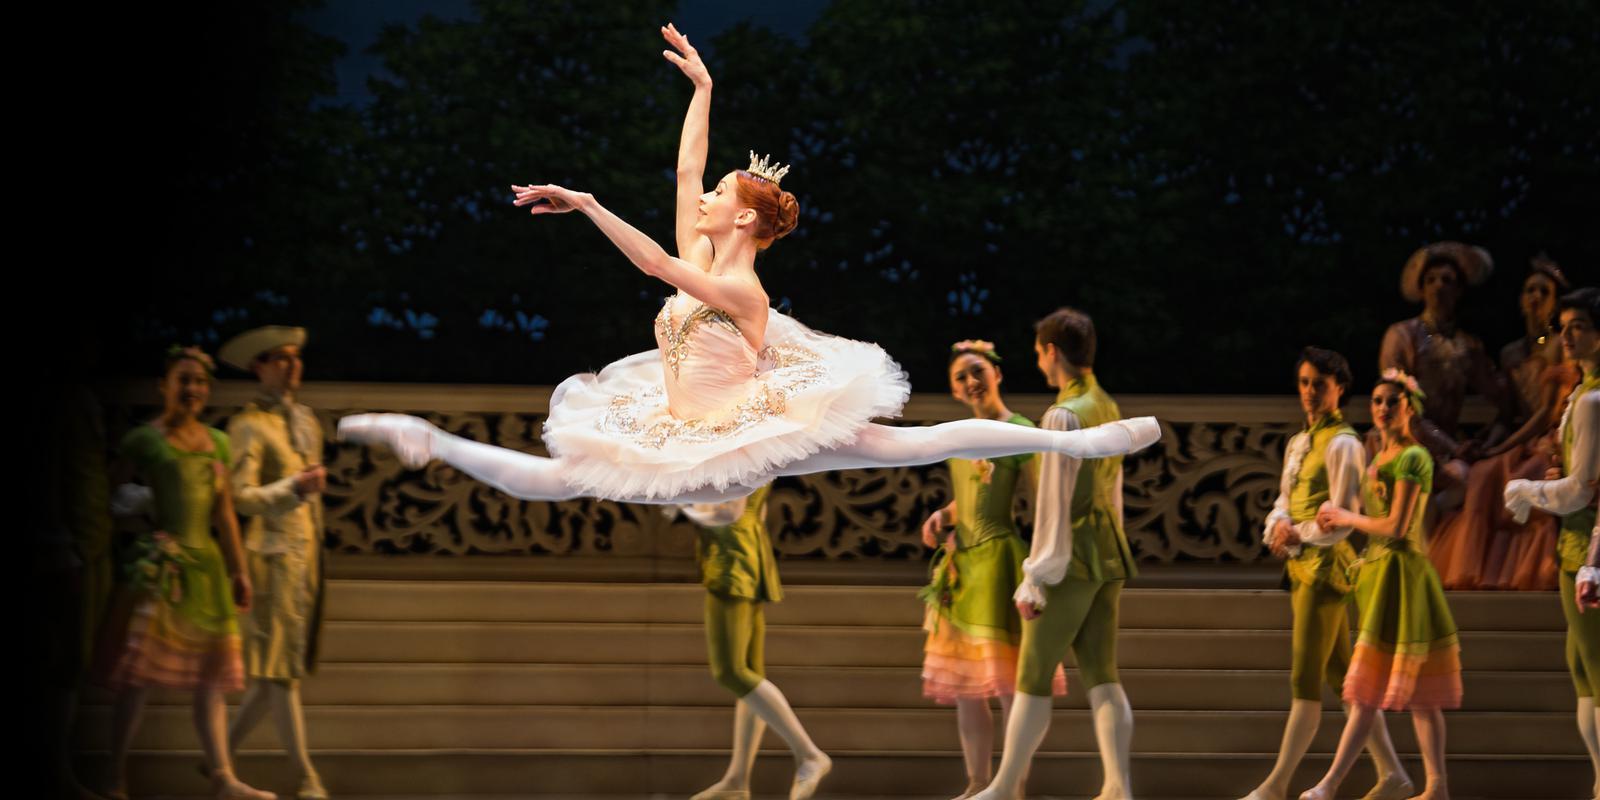 5. Sleeping Beauty Princess Aurora